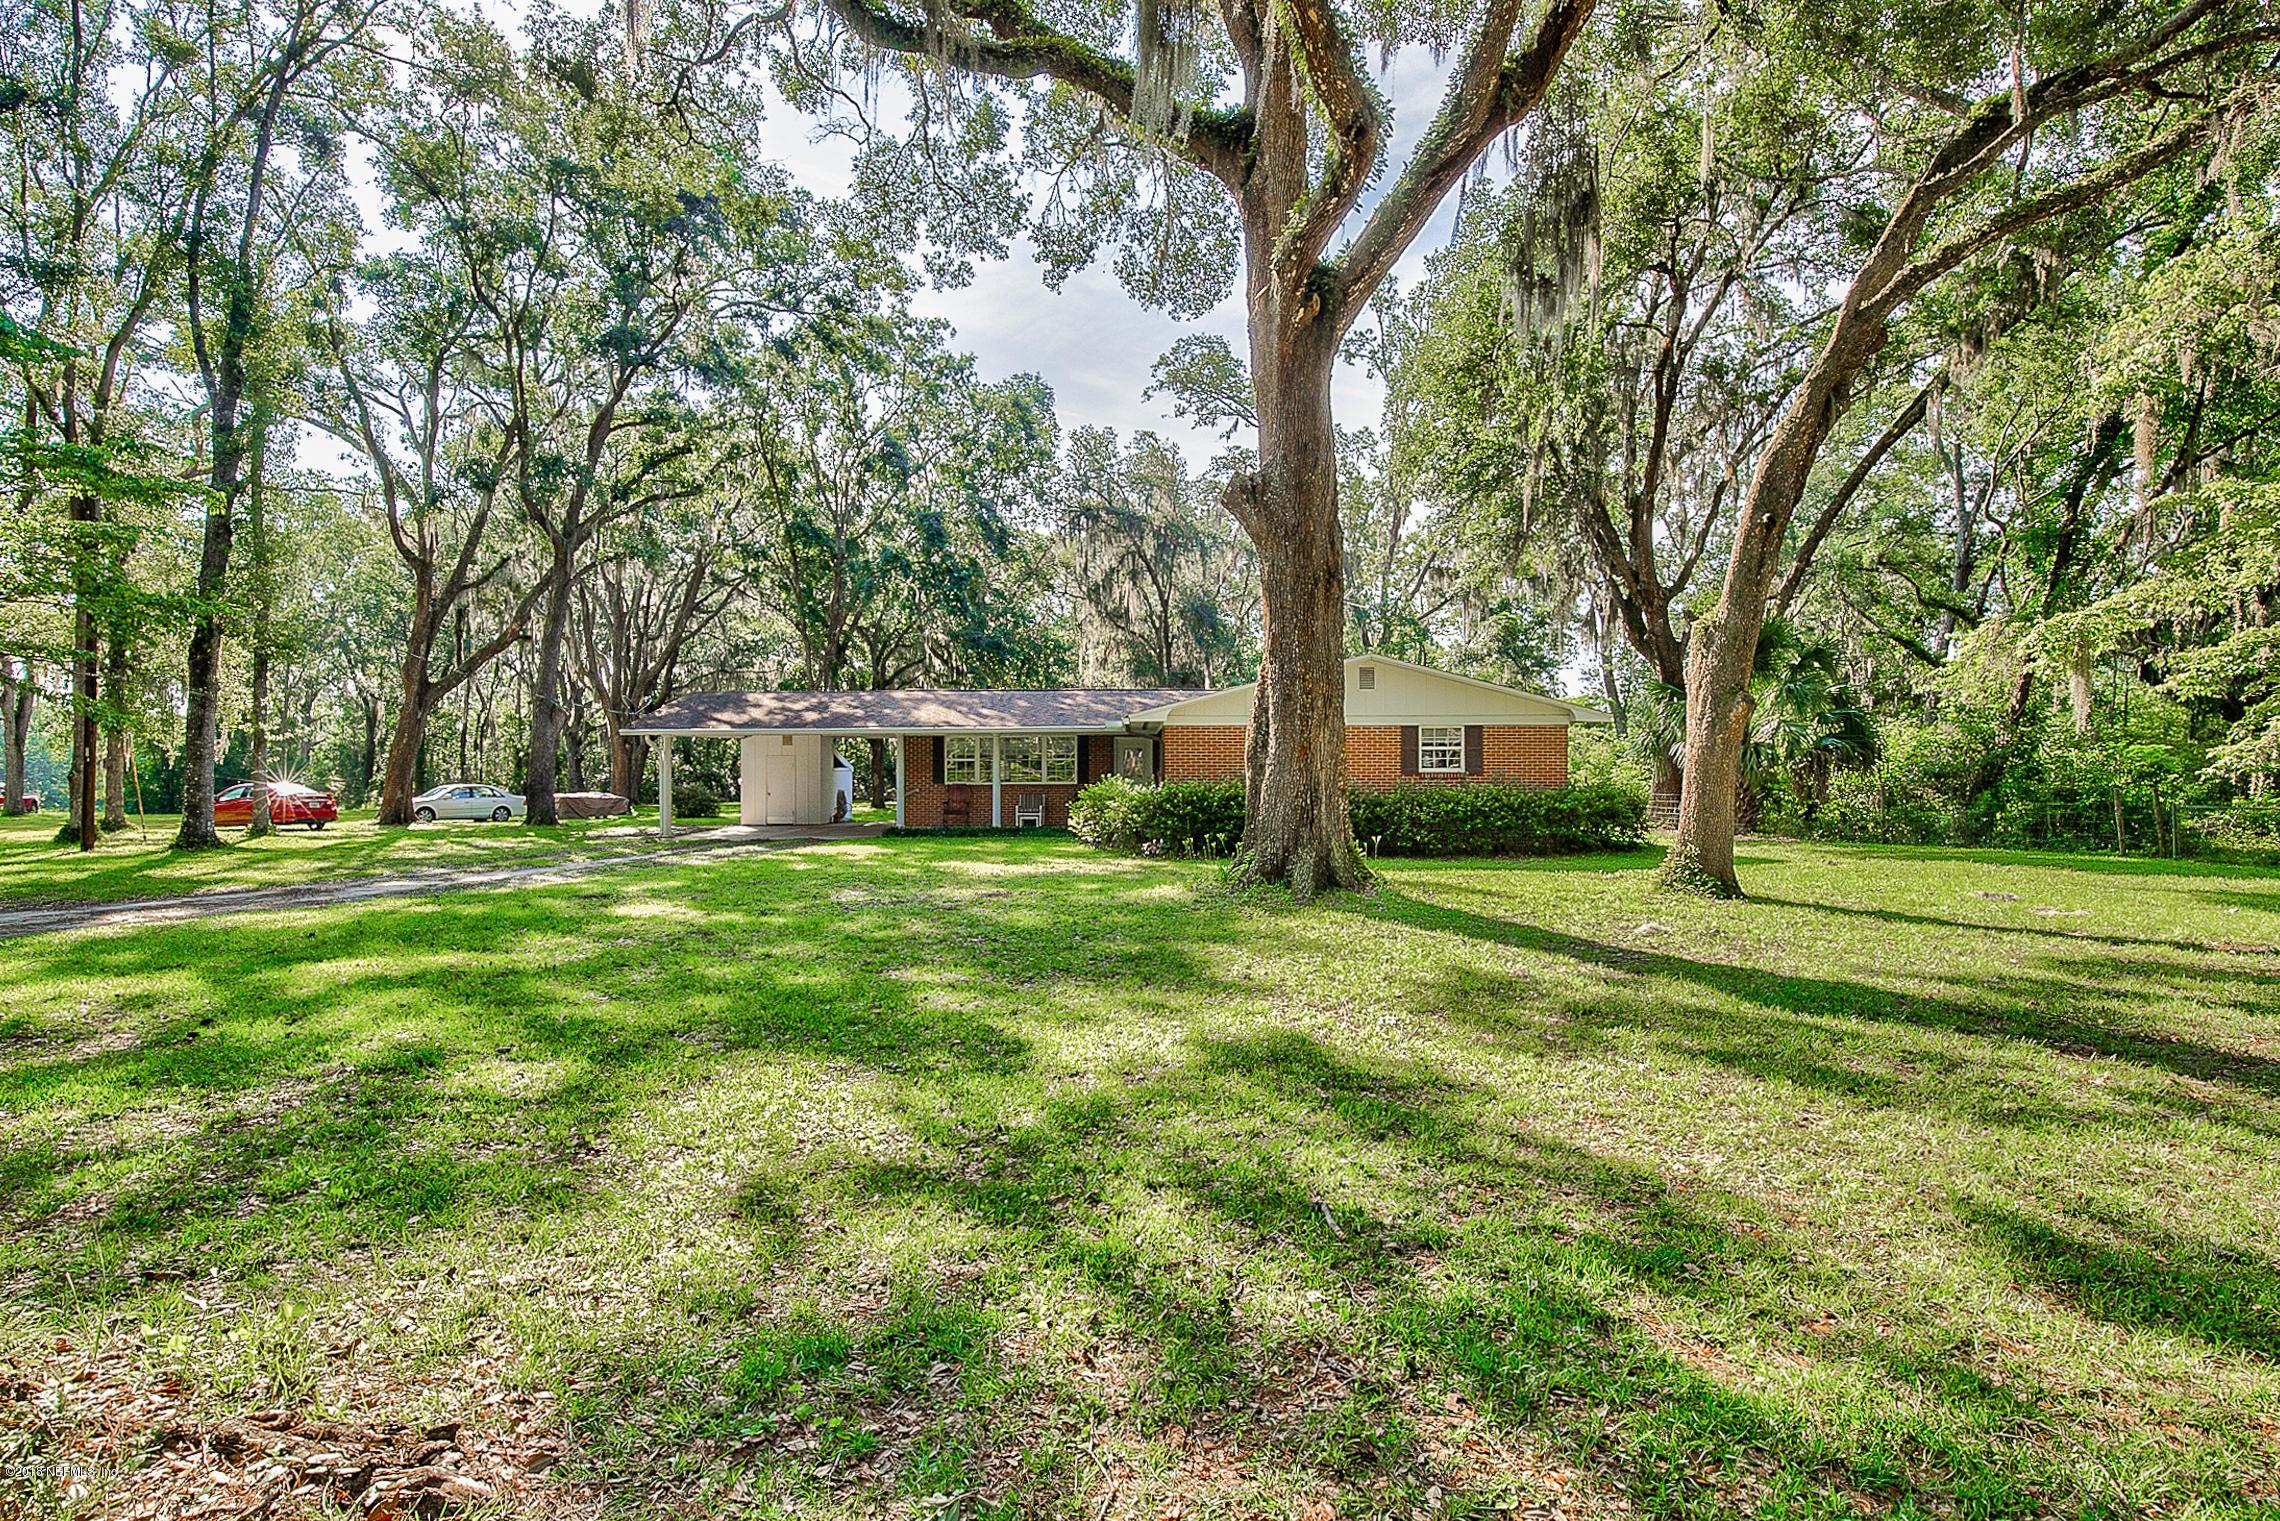 37219 PINERIDGE, HILLIARD, FLORIDA 32046, 3 Bedrooms Bedrooms, ,2 BathroomsBathrooms,Residential - single family,For sale,PINERIDGE,940467